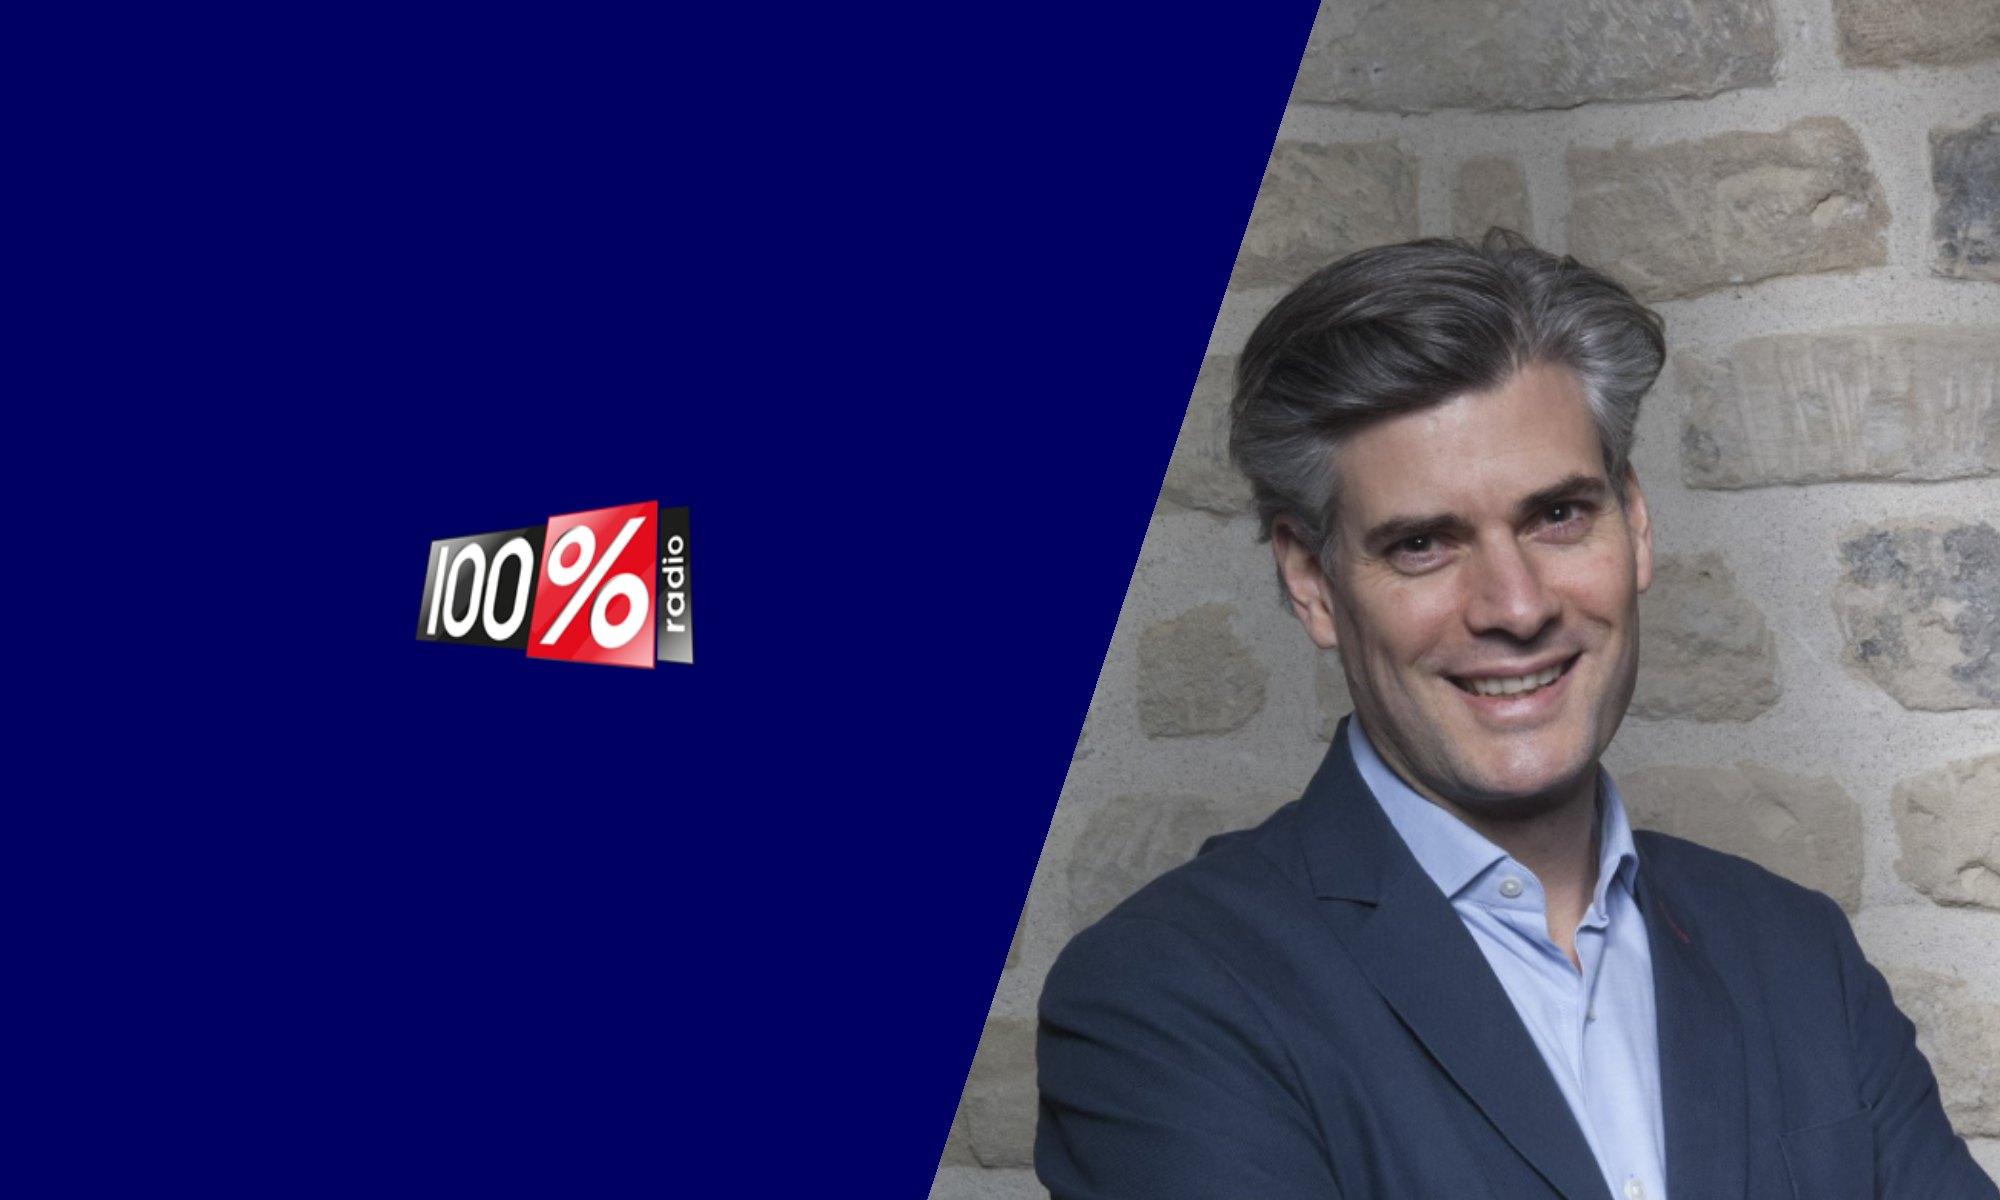 Florian Reinaud en interview sur 100% Radio